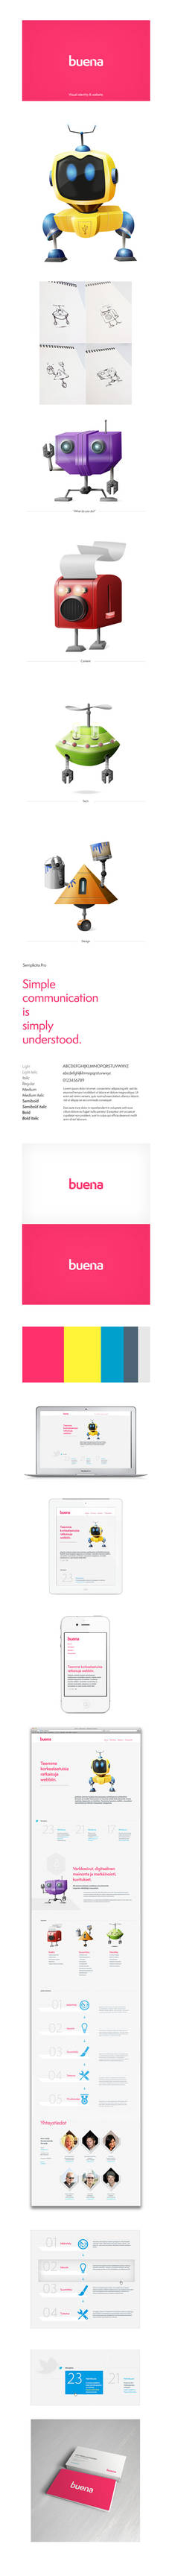 Buena visual identity and website